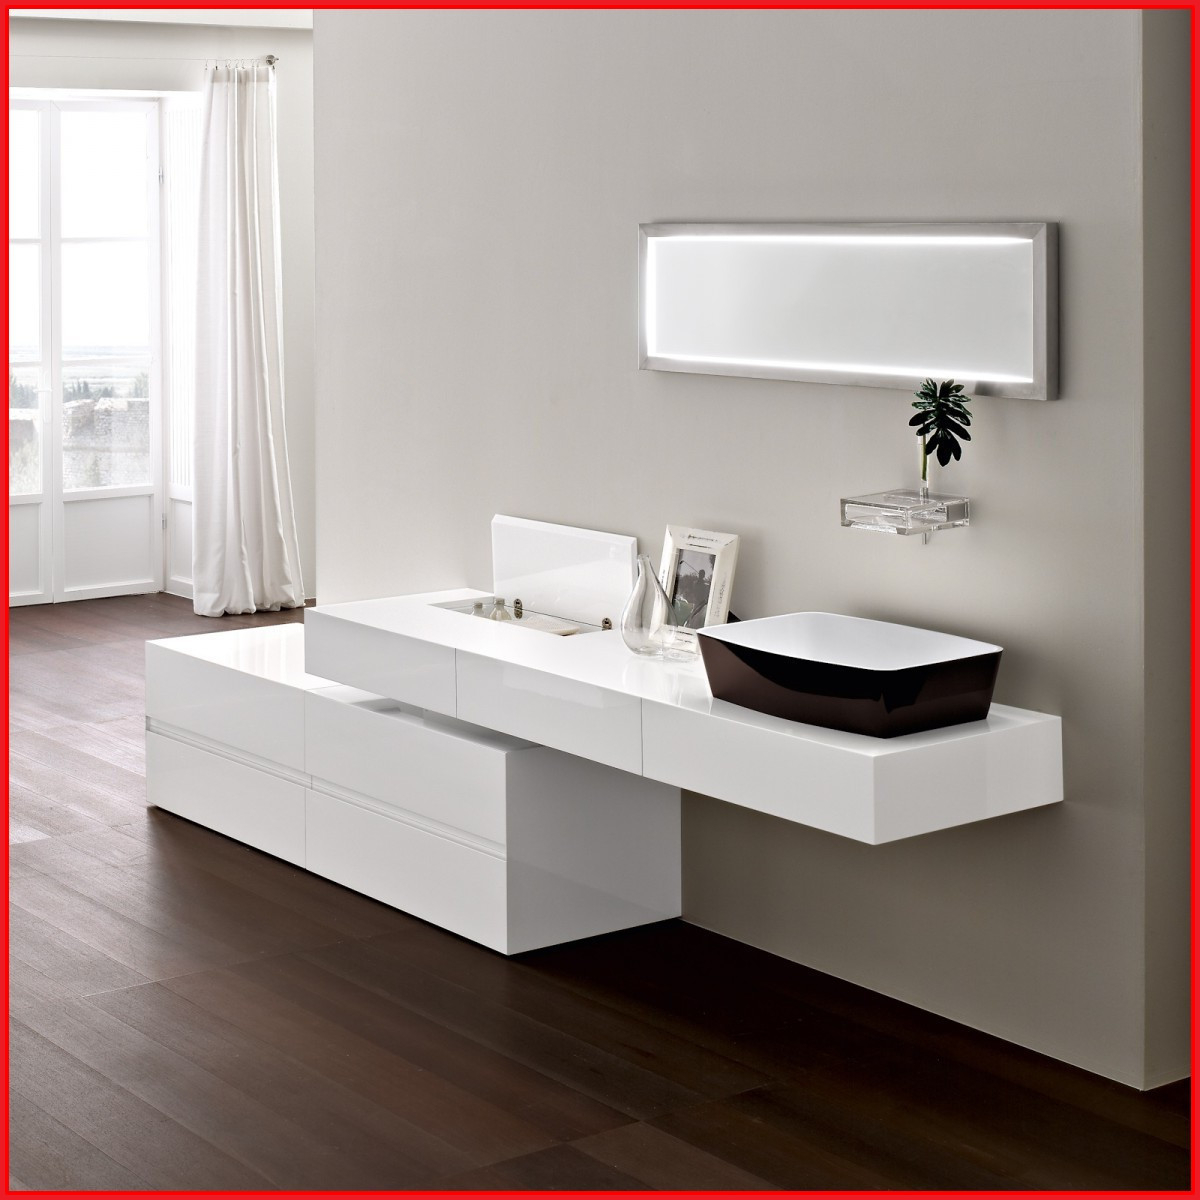 Muebles De Baño Blanco Ffdn Muebles De Baà O En Blanco Muebles De BaO De DiseO Mueble